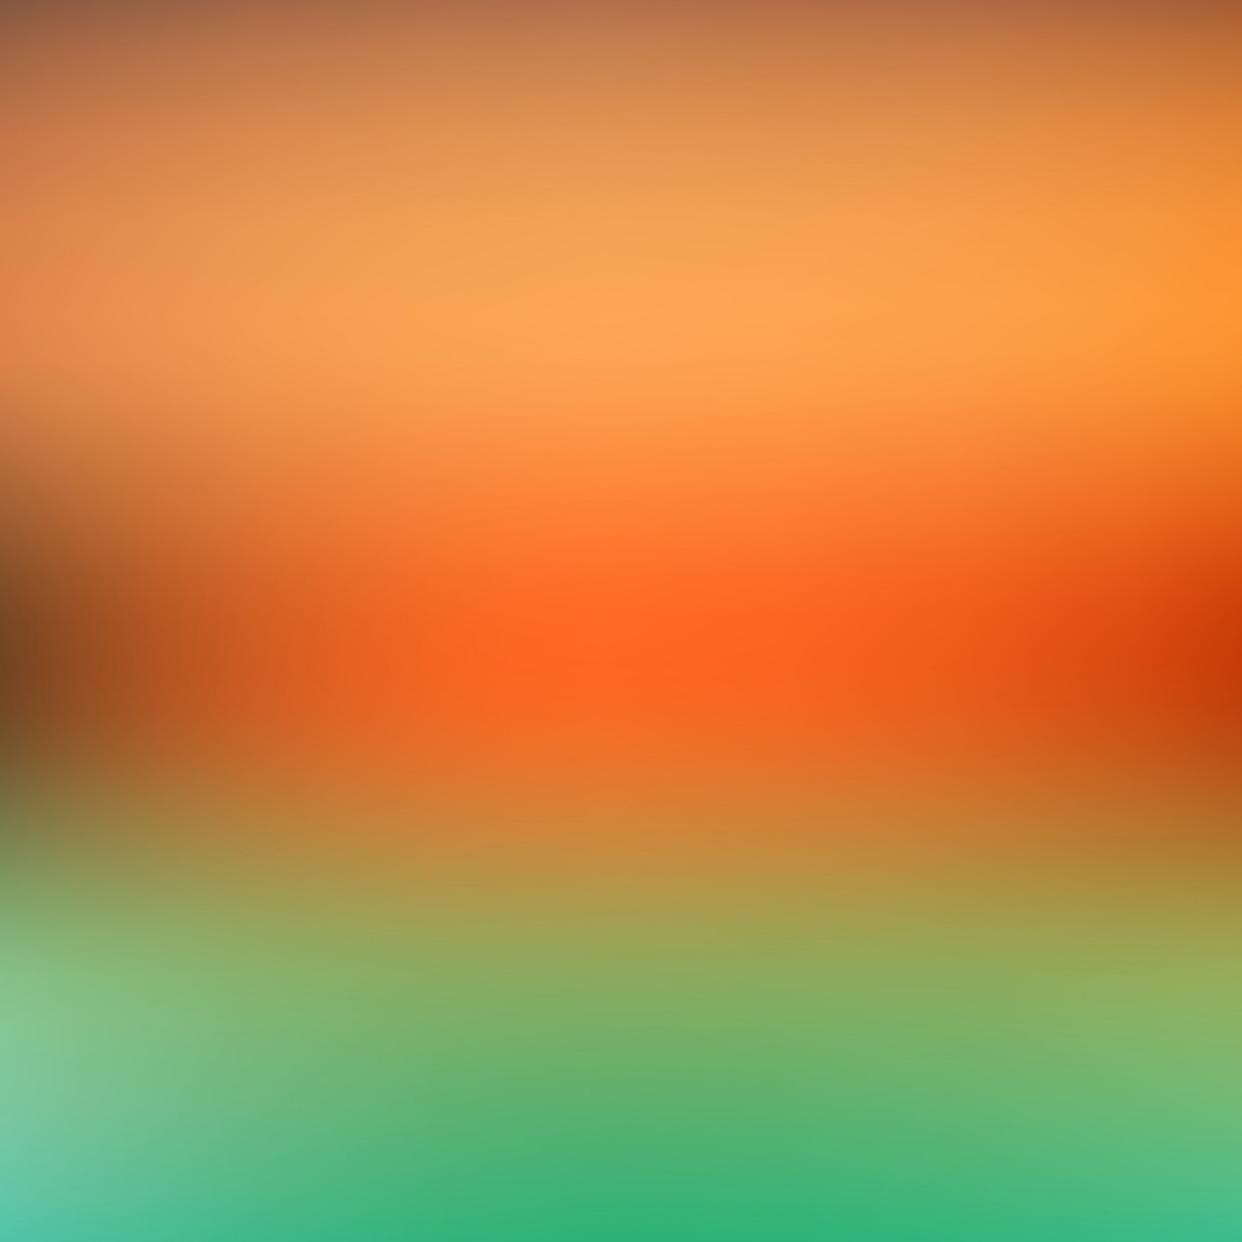 Freetoedit Background Overlay Edit Blur Tumblr Fondo Difuminado Green Orange Verde Naranja Fondover Phone Wallpaper Images Natural Landmarks Image